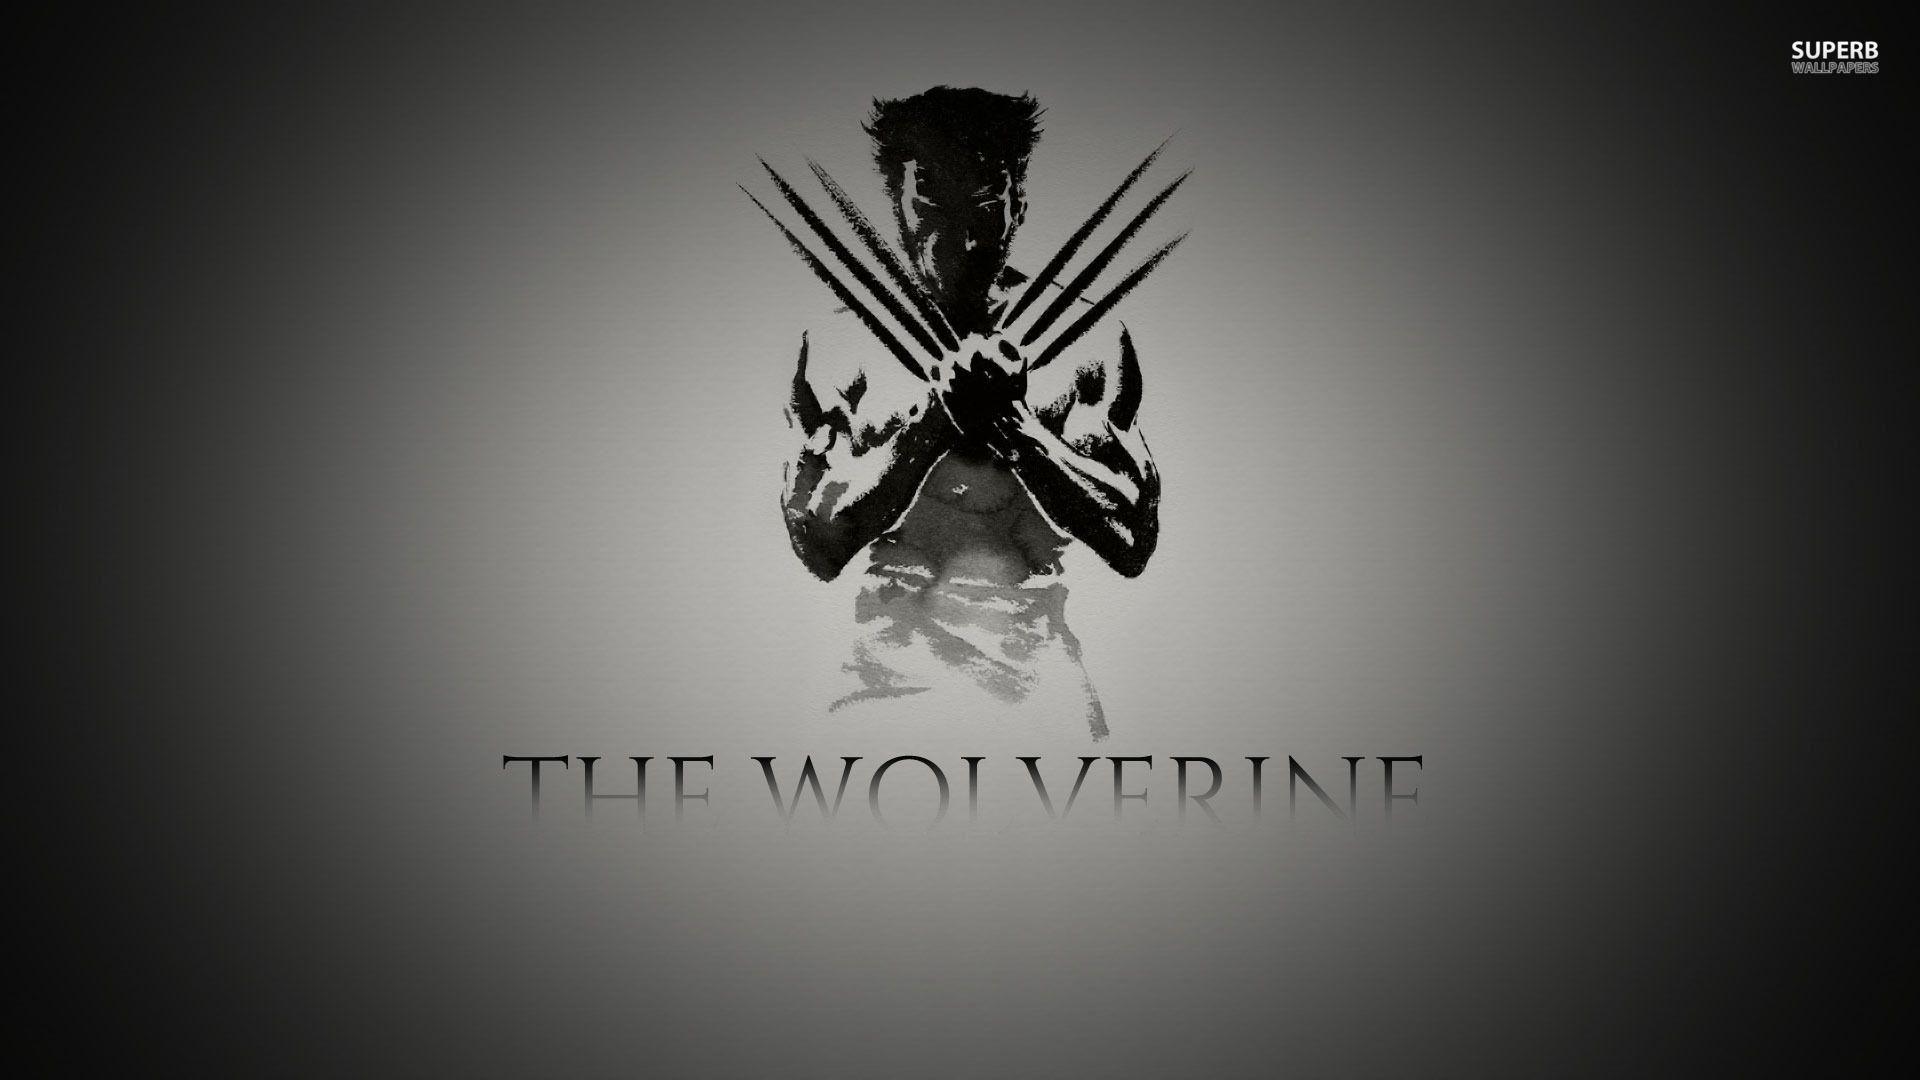 Wolverine Marvel 1080 Wolverine Wallpapers Hd Wallpaper Cave Hd Wallpapers For Pc Wallpaper Pc Wolverine